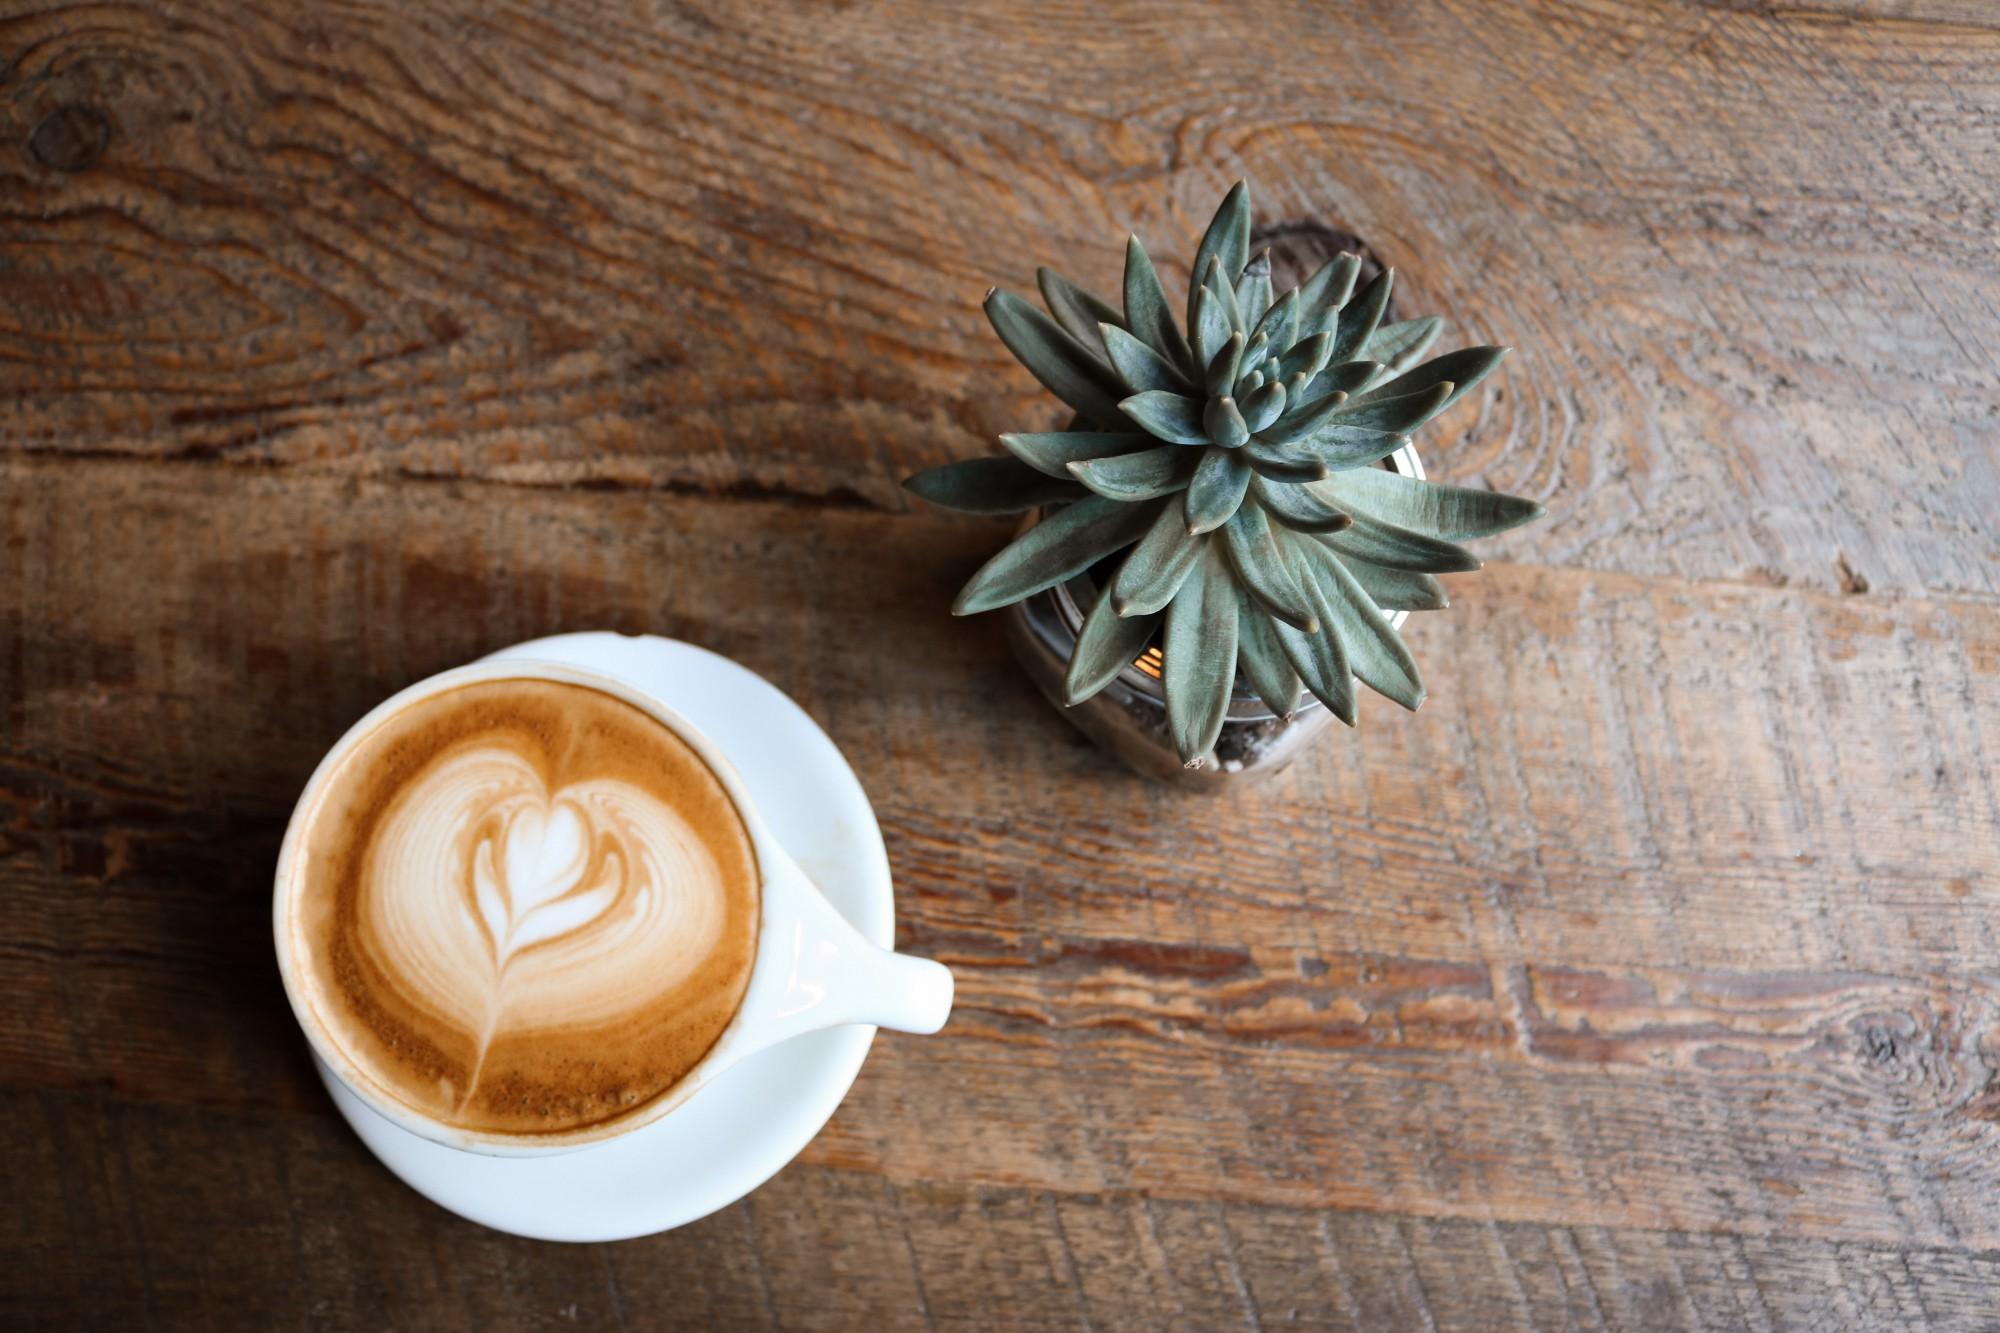 1-vi-otkrivame-kako-utrinskoto-kafe-da-go-napravite-pozdrava-opcija-www.kafepauza.mk_